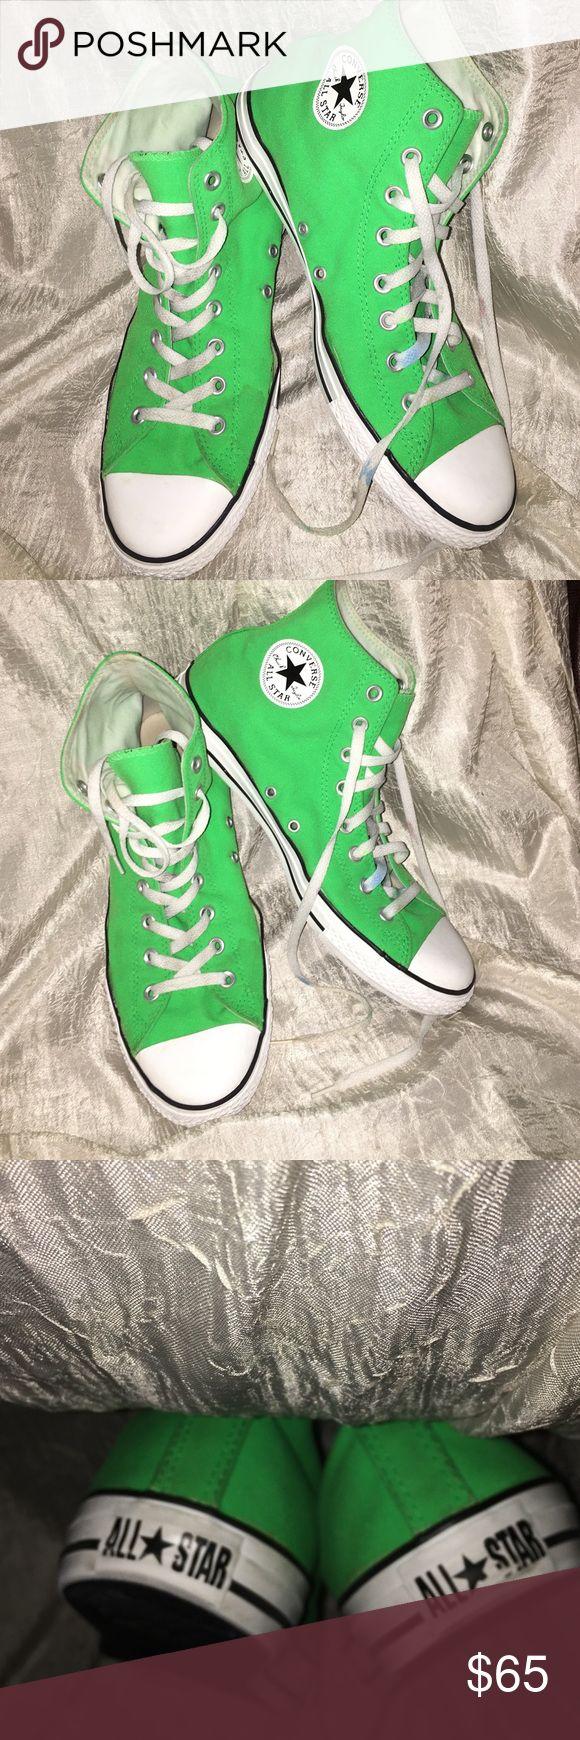 ⚡️FLASH SALE⚡️Converse All Star High Top Sneakers Converse All Star High Top Sneakers size 11 men's Converse Shoes Sneakers